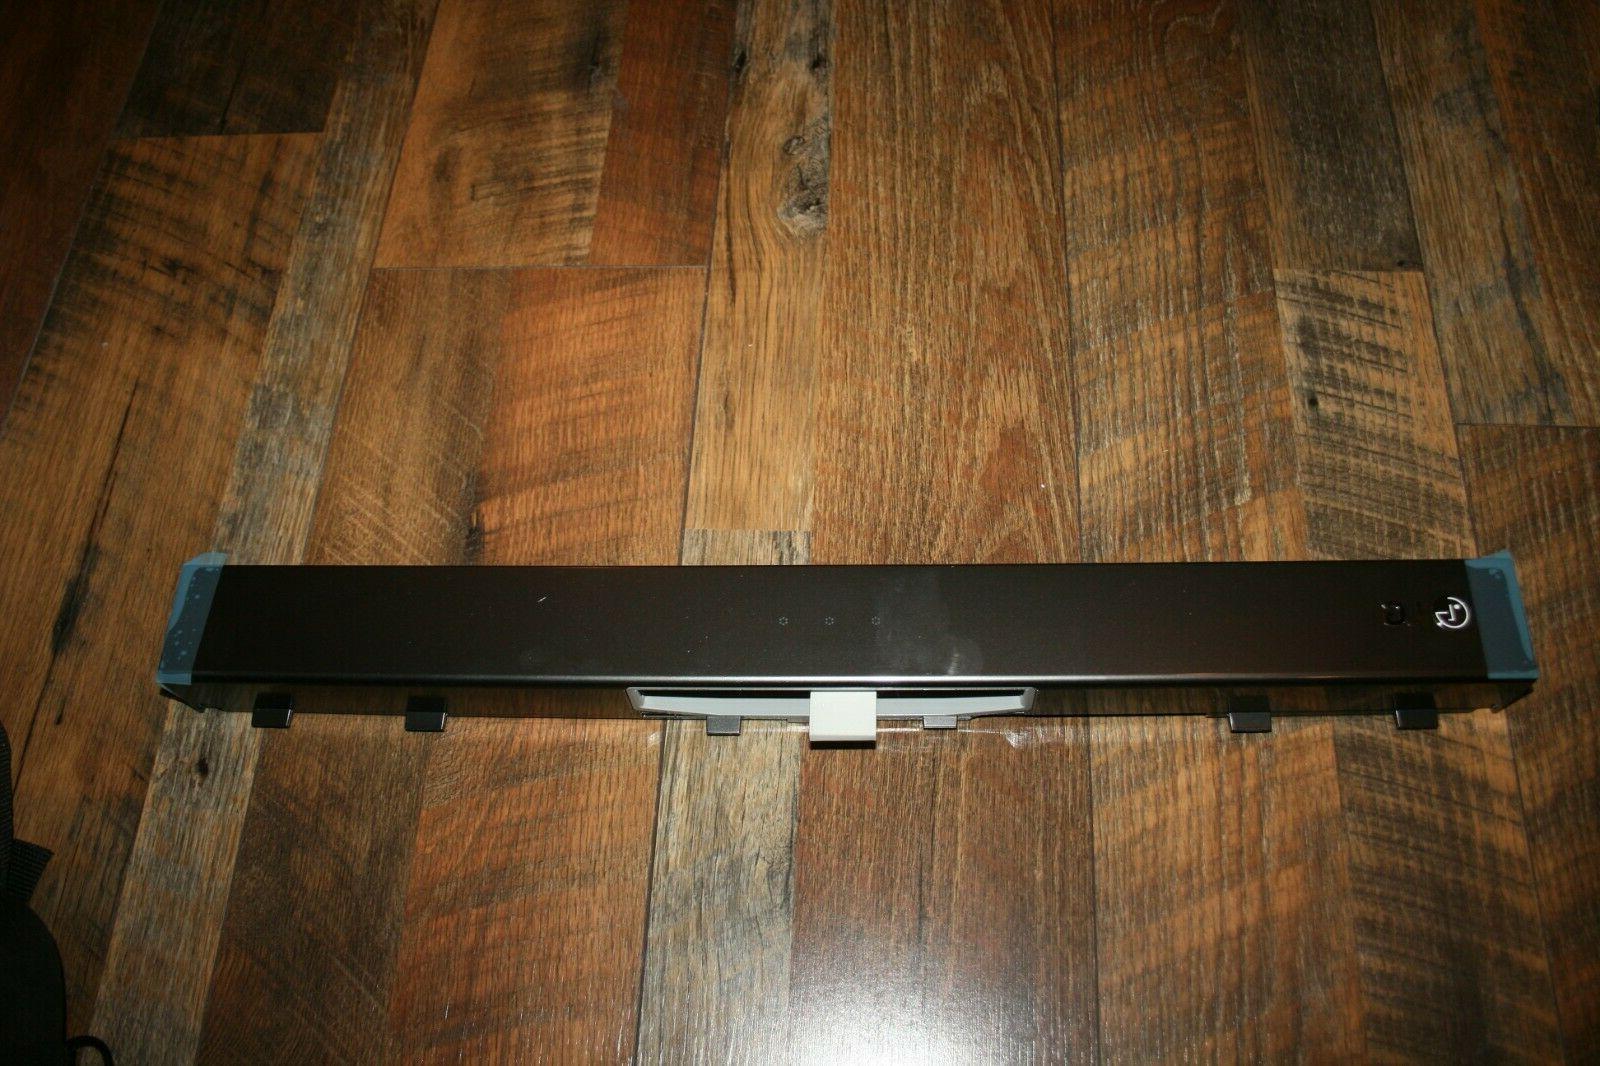 LG-Dishwasher control assembly LG AGL75172606